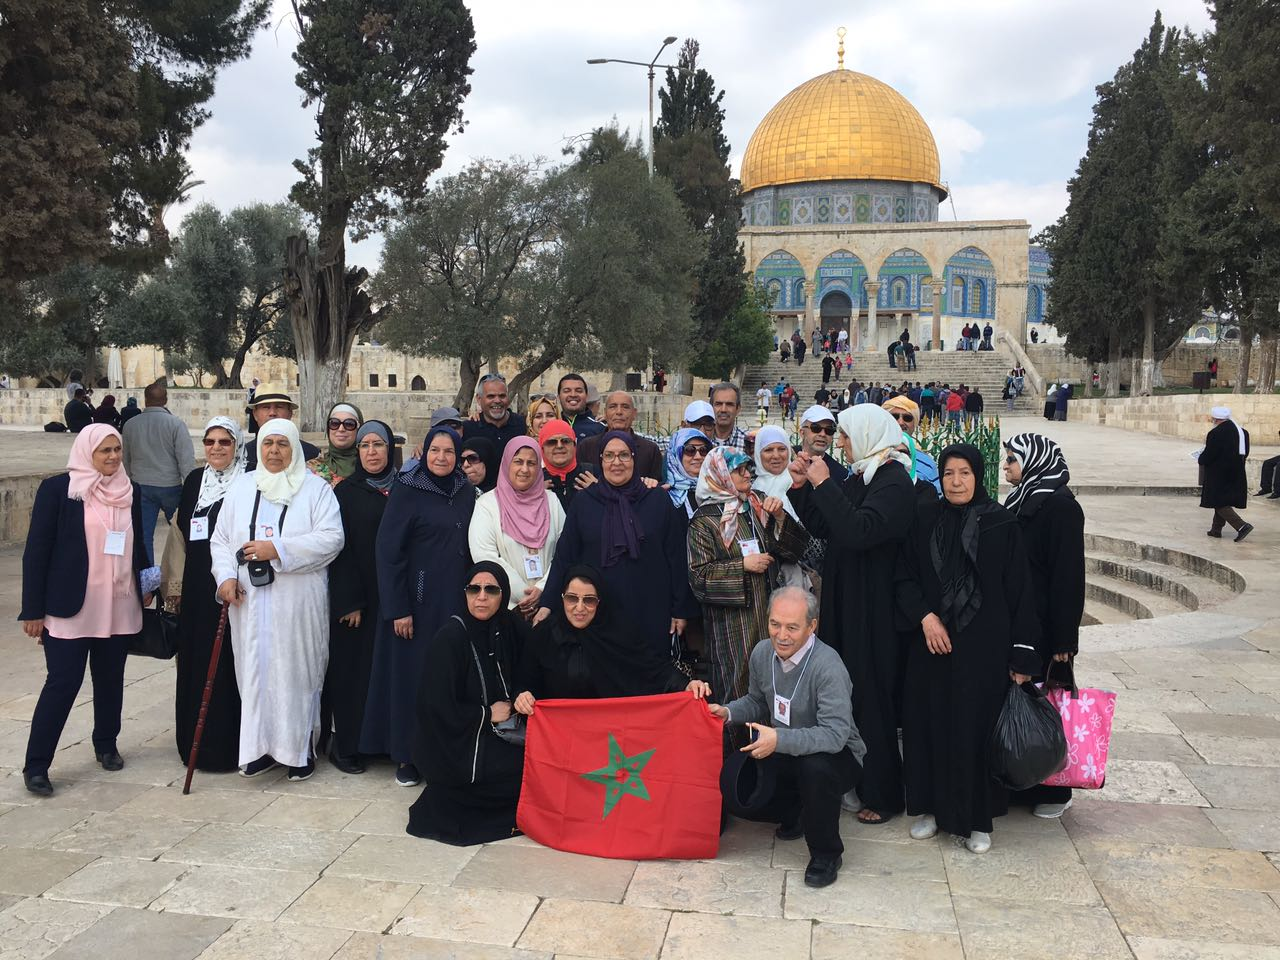 Omra via Palestine